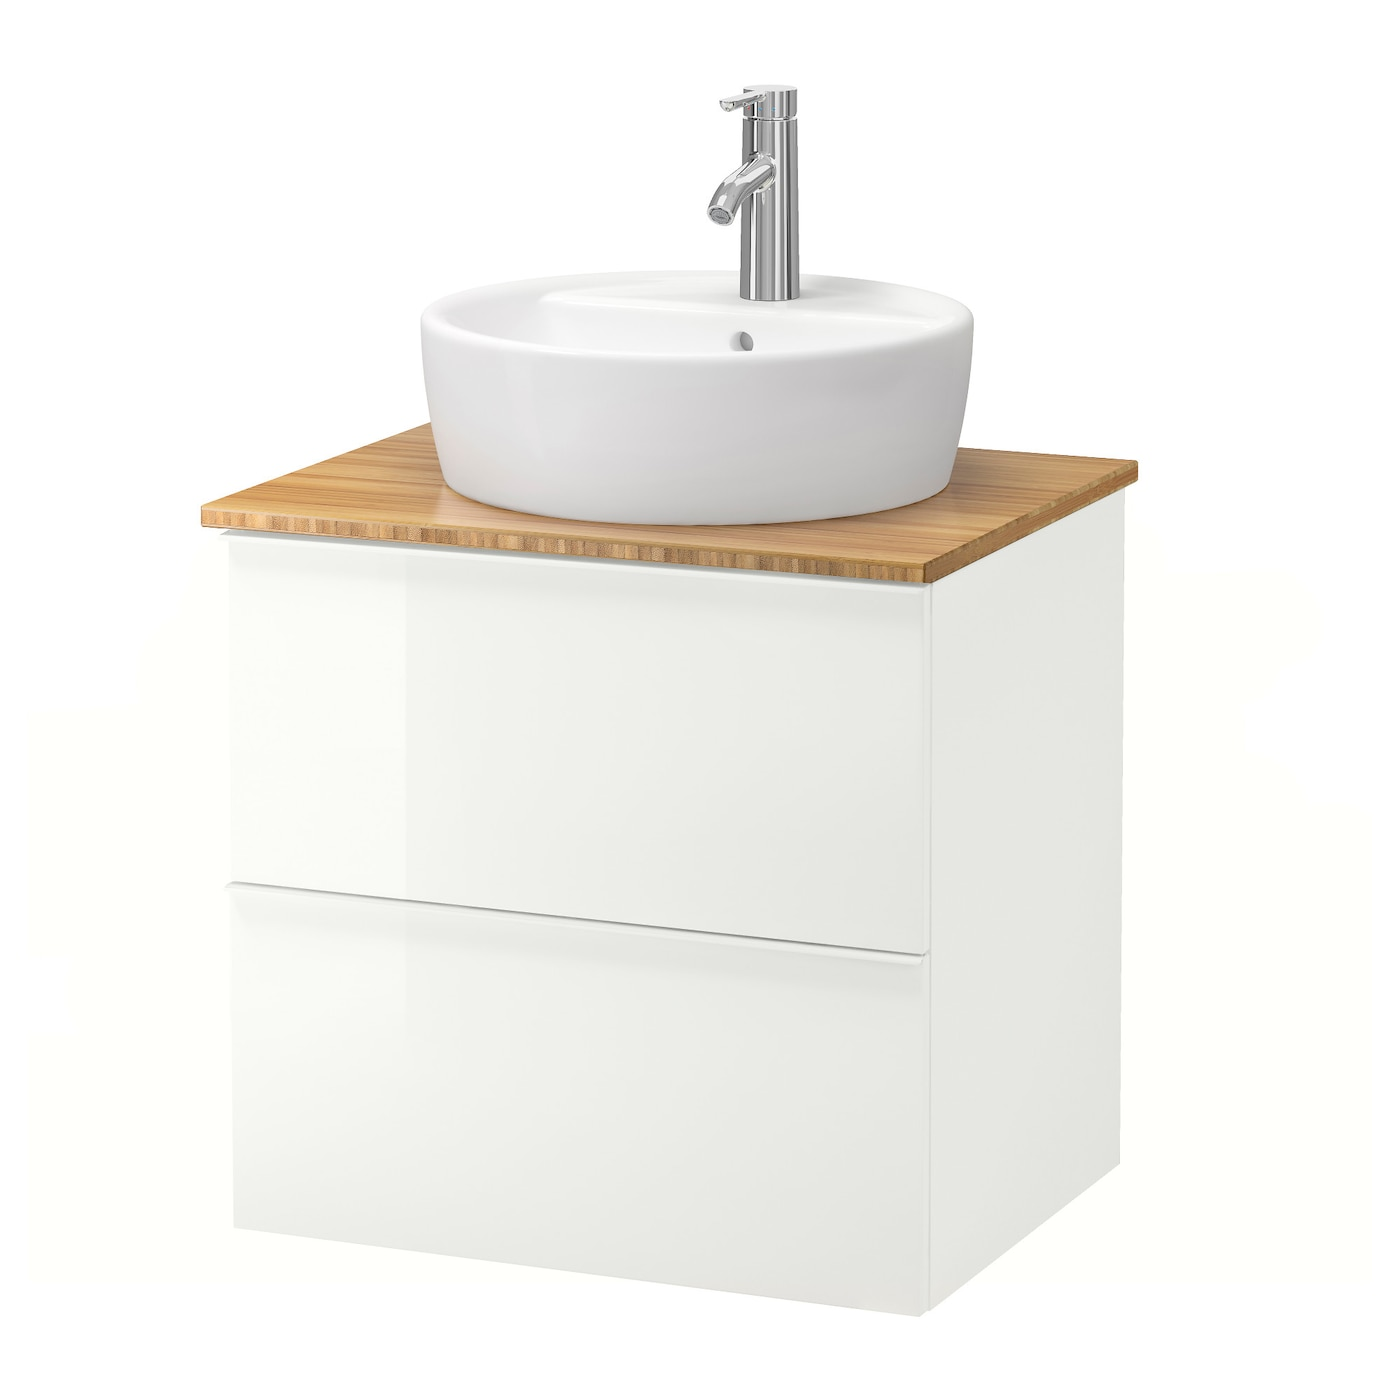 godmorgon tolken t rnviken wsh stnd w countertop 45 wsh basin high gloss white bamboo 62x49x74. Black Bedroom Furniture Sets. Home Design Ideas